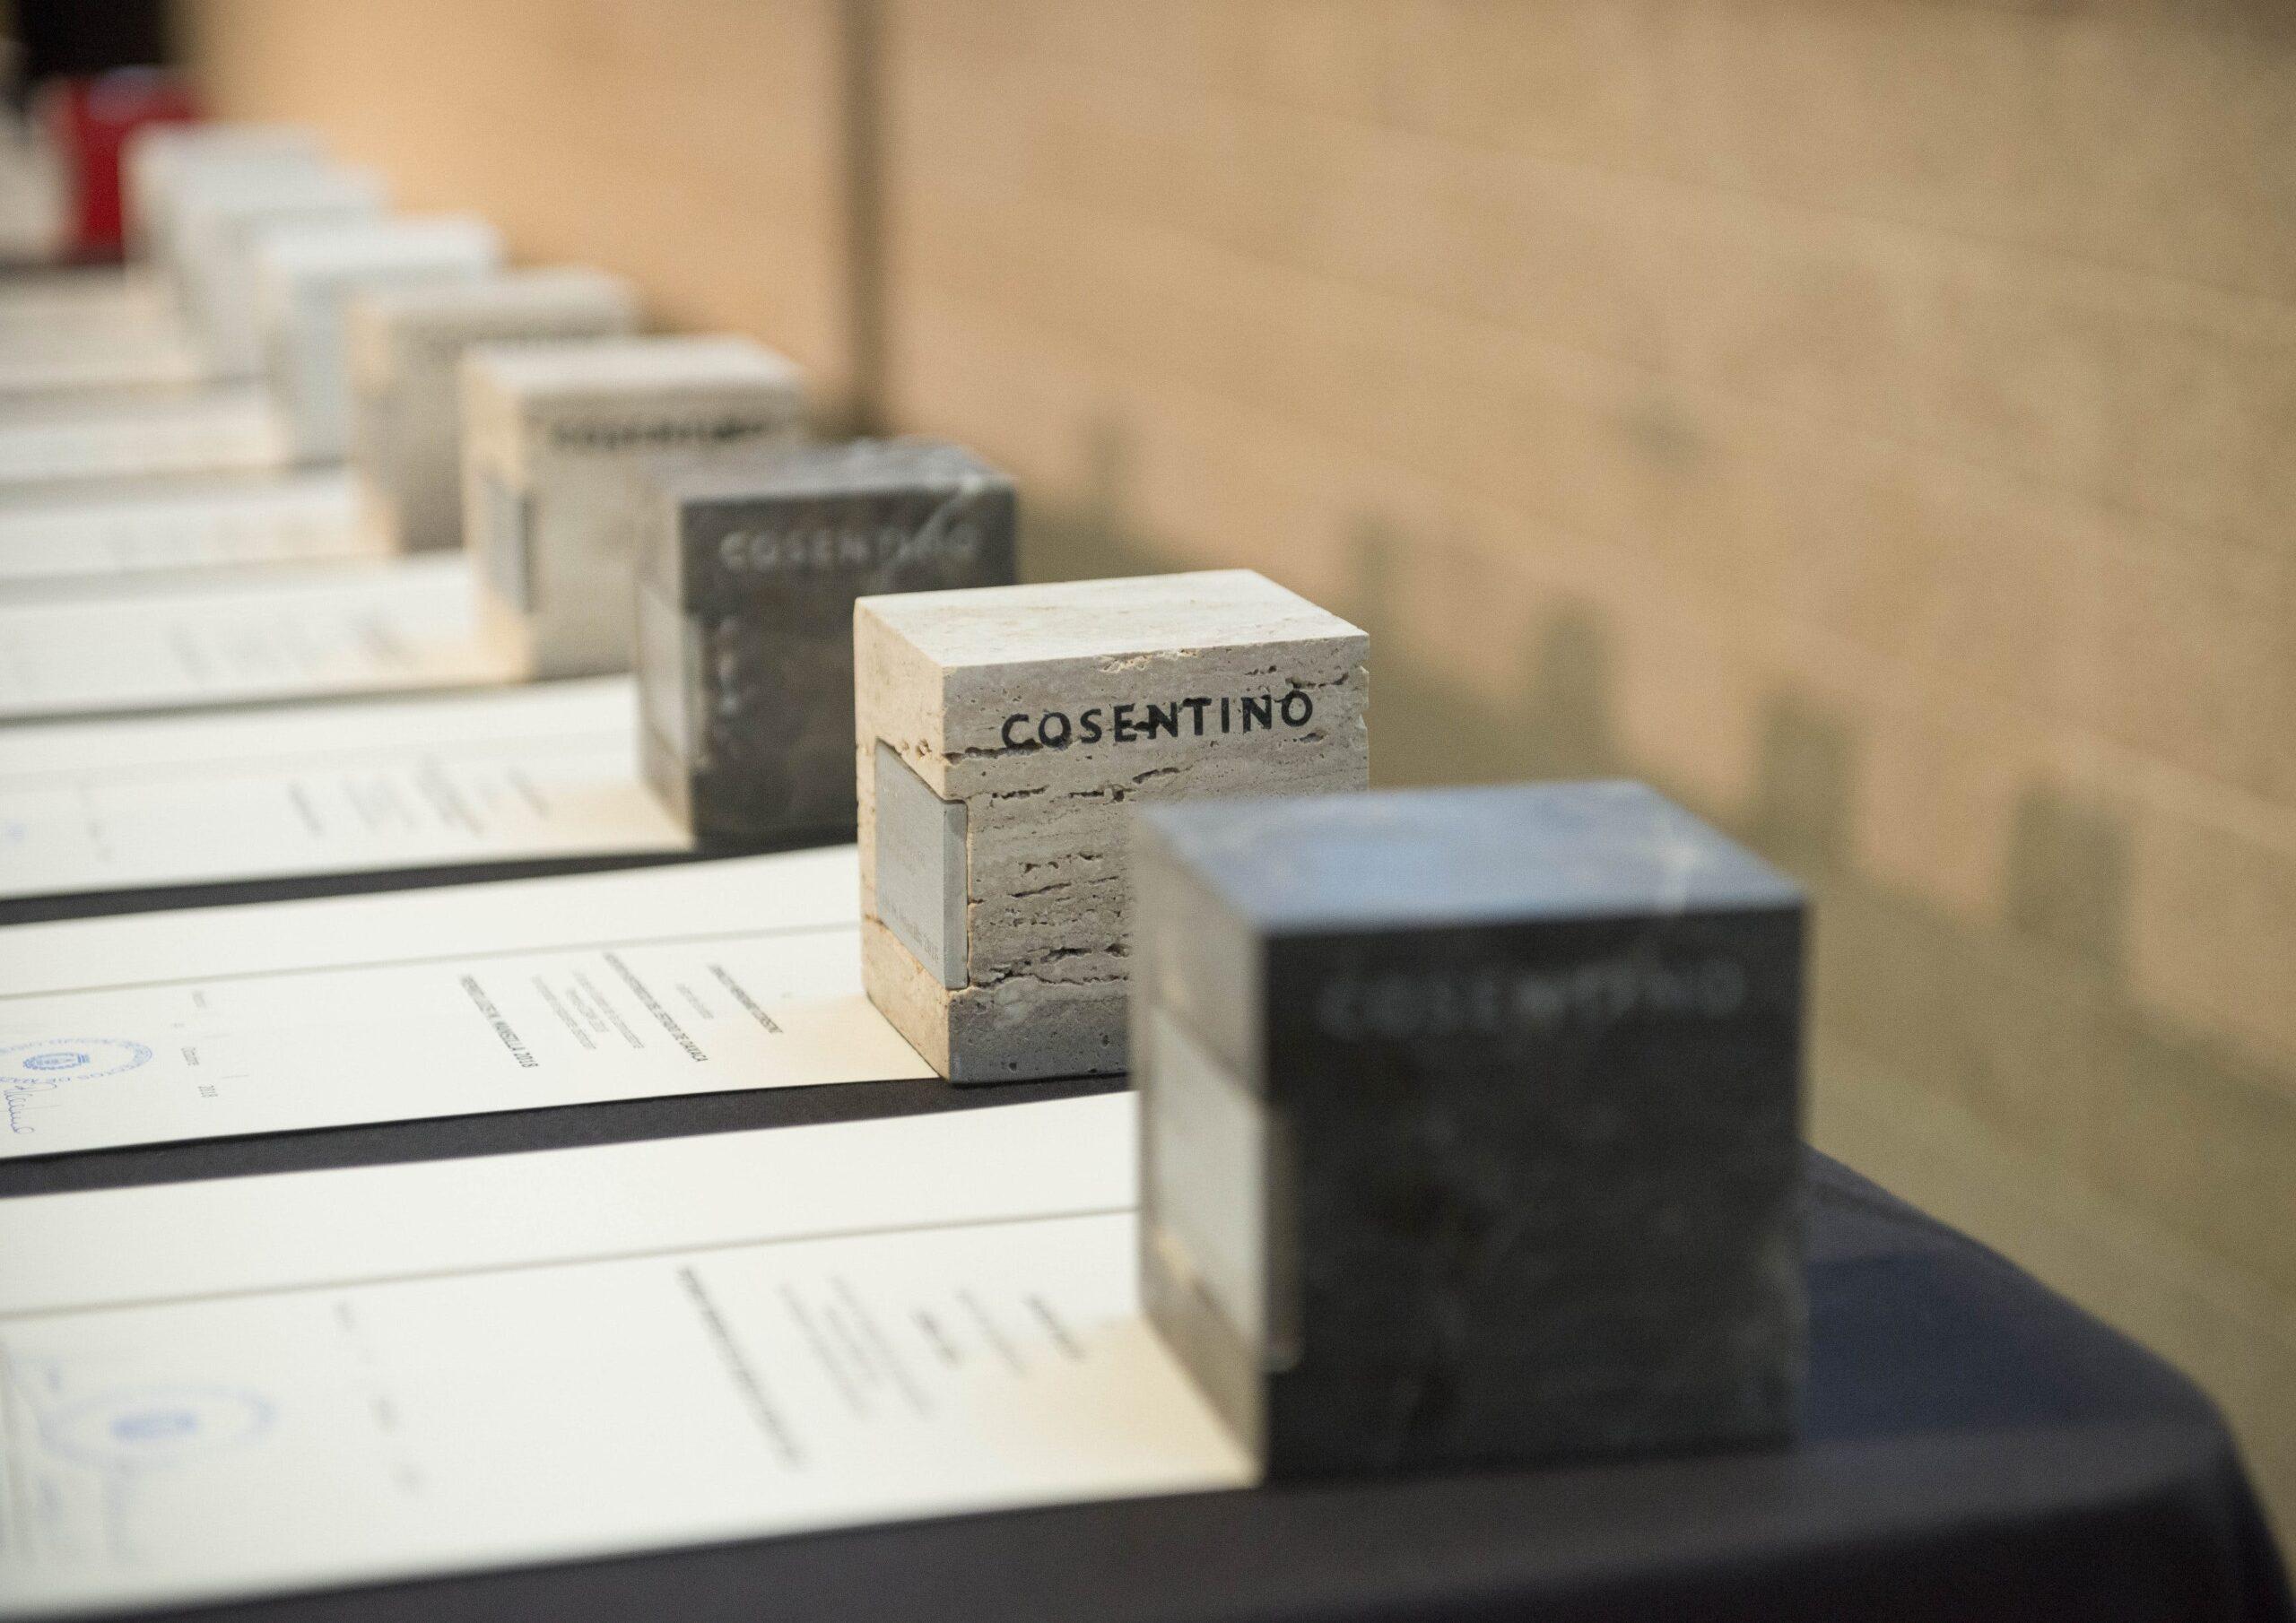 Image of prensa Estatuillas Foto de AAmado COAMpremios 1 scaled in Madrid Architecture Week 2018 - Cosentino